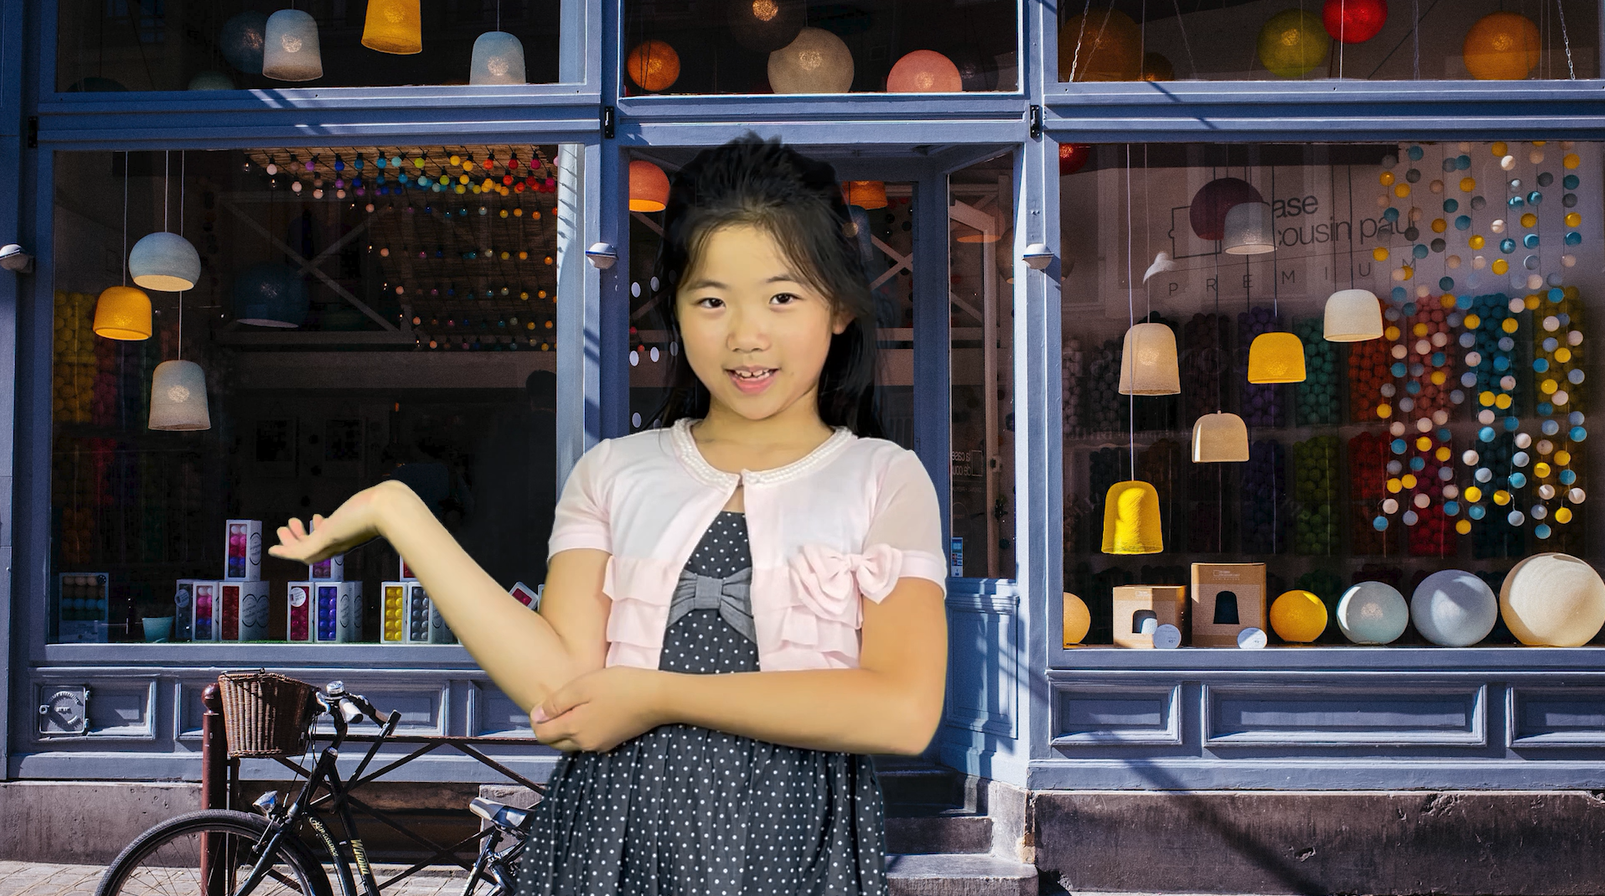 UniStar2021 卡通配音+廣告表演雙語夏令營 表演班成果展新鮮出爐!